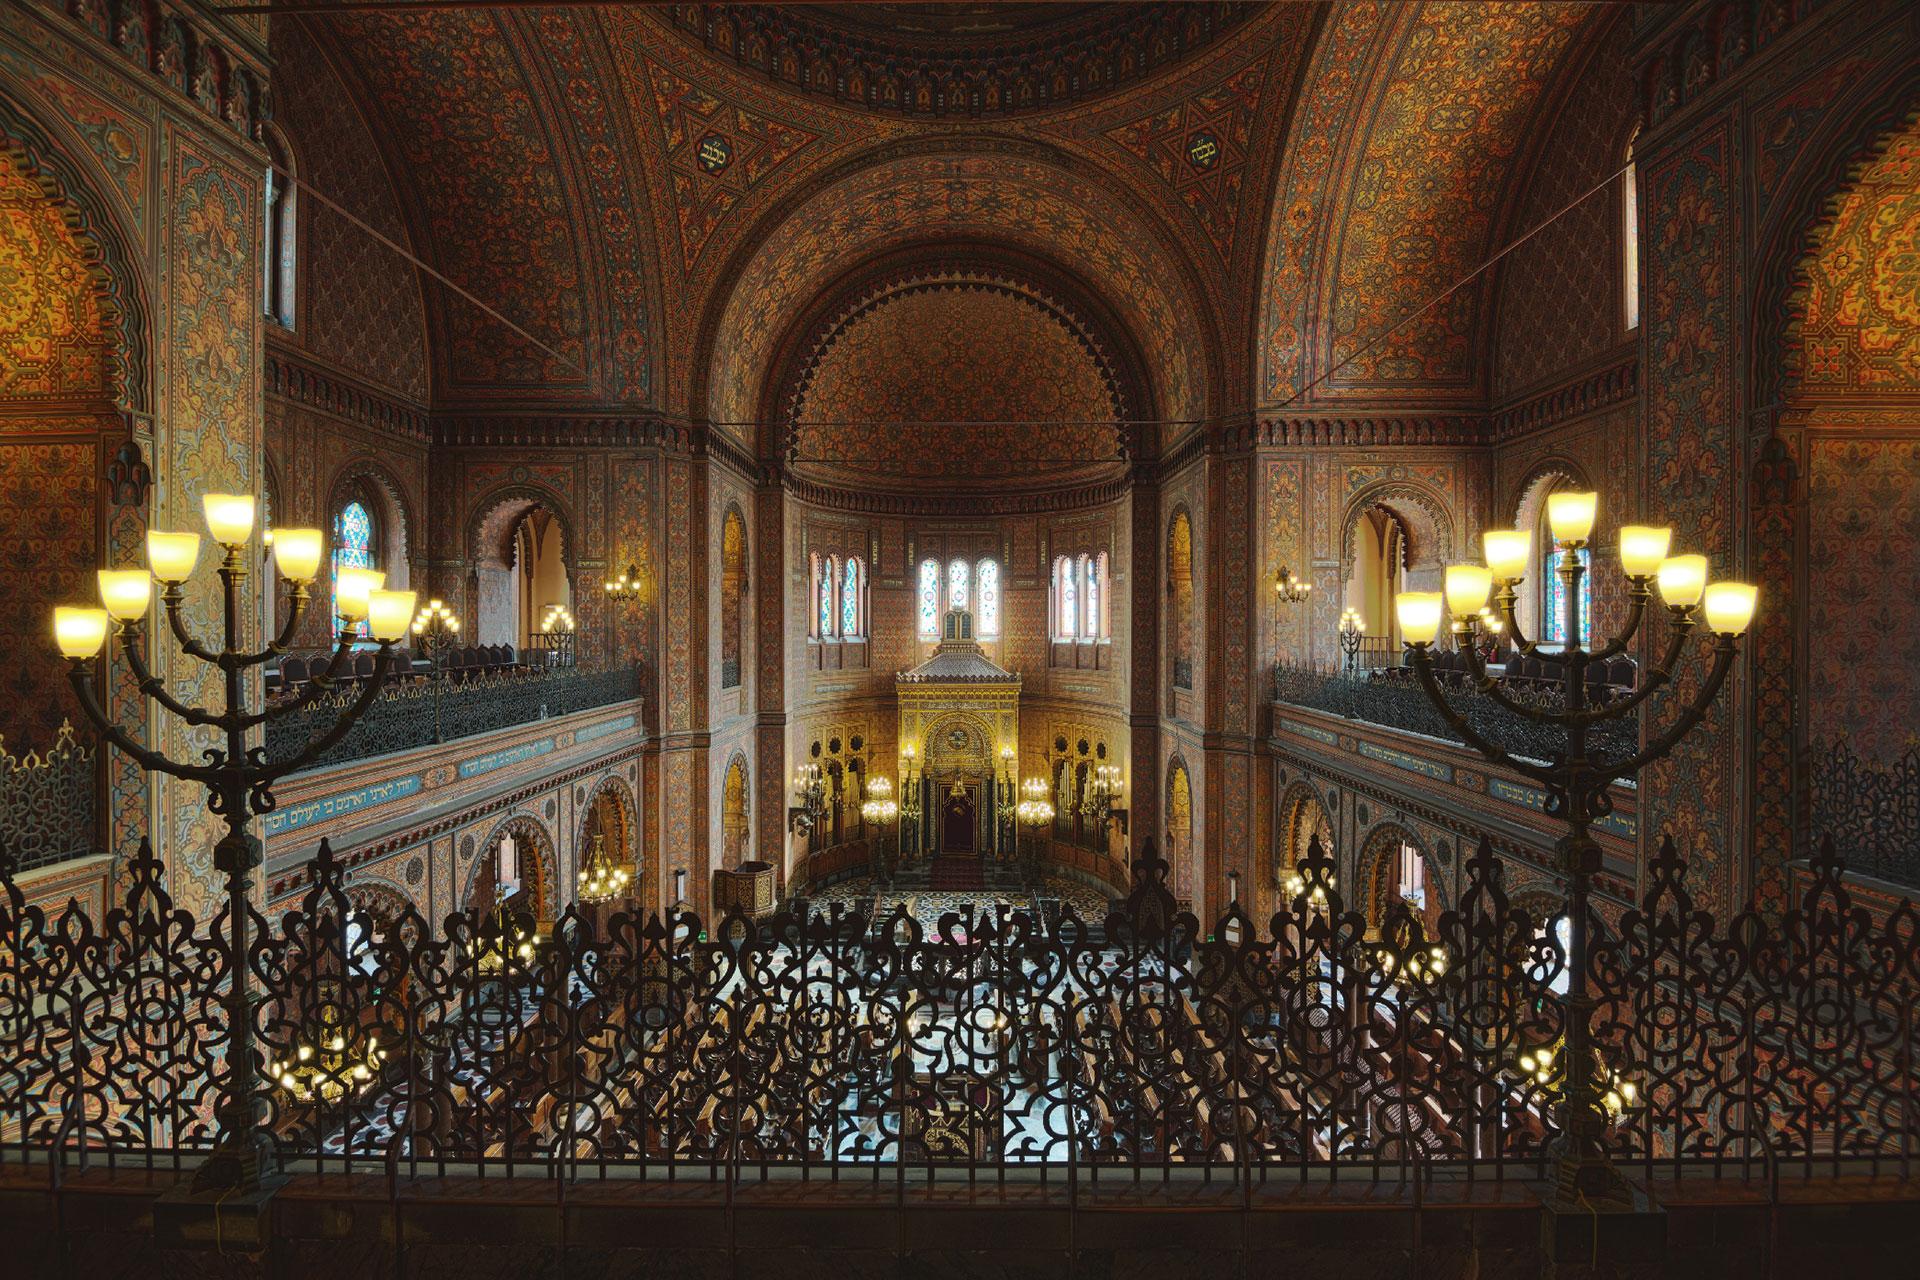 sinagoga.jpg